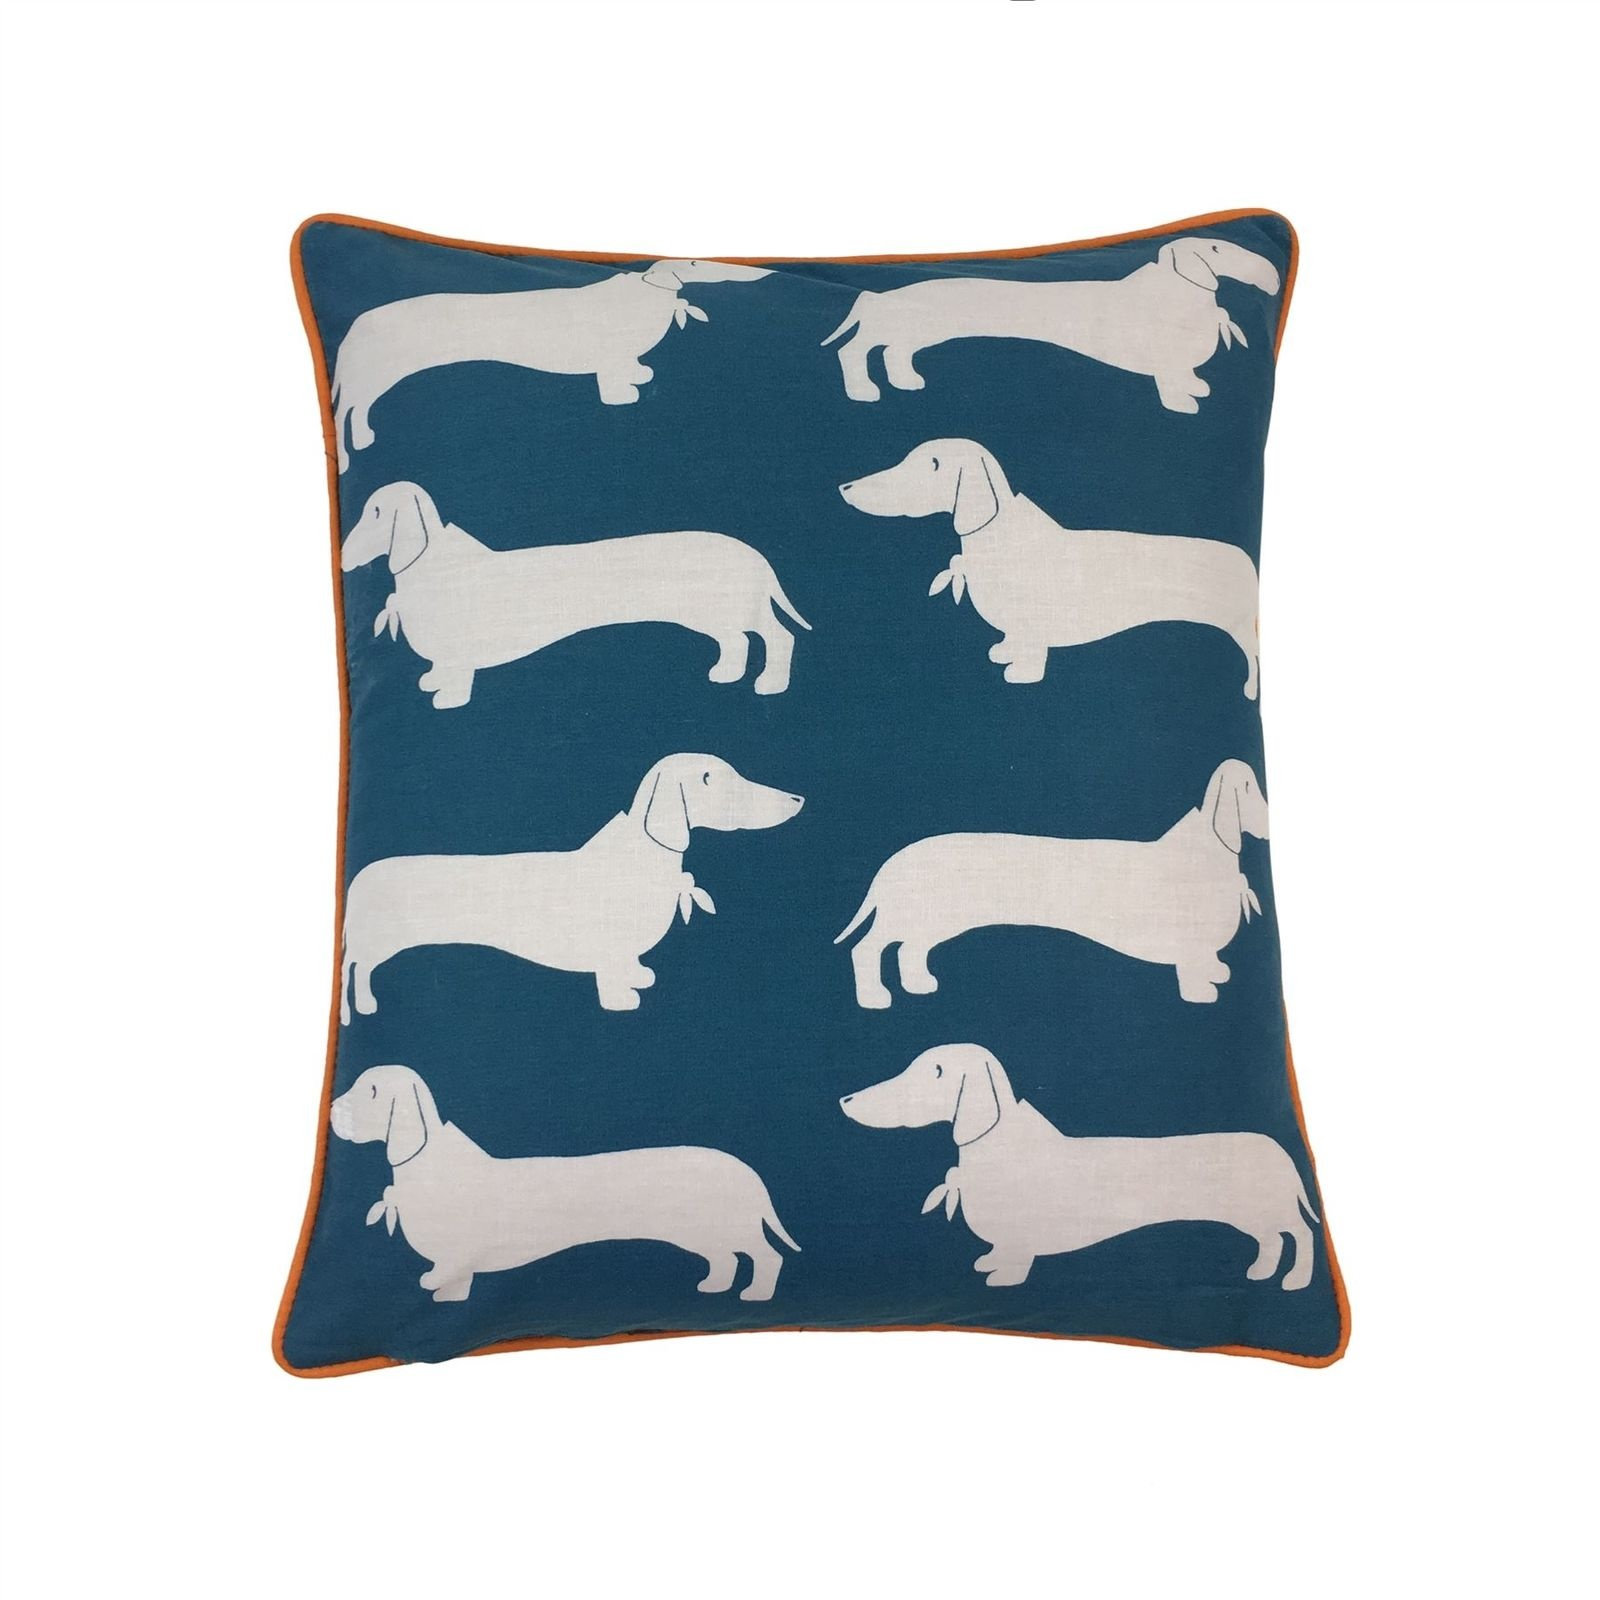 CharactersMania Sausage Dog Cushion